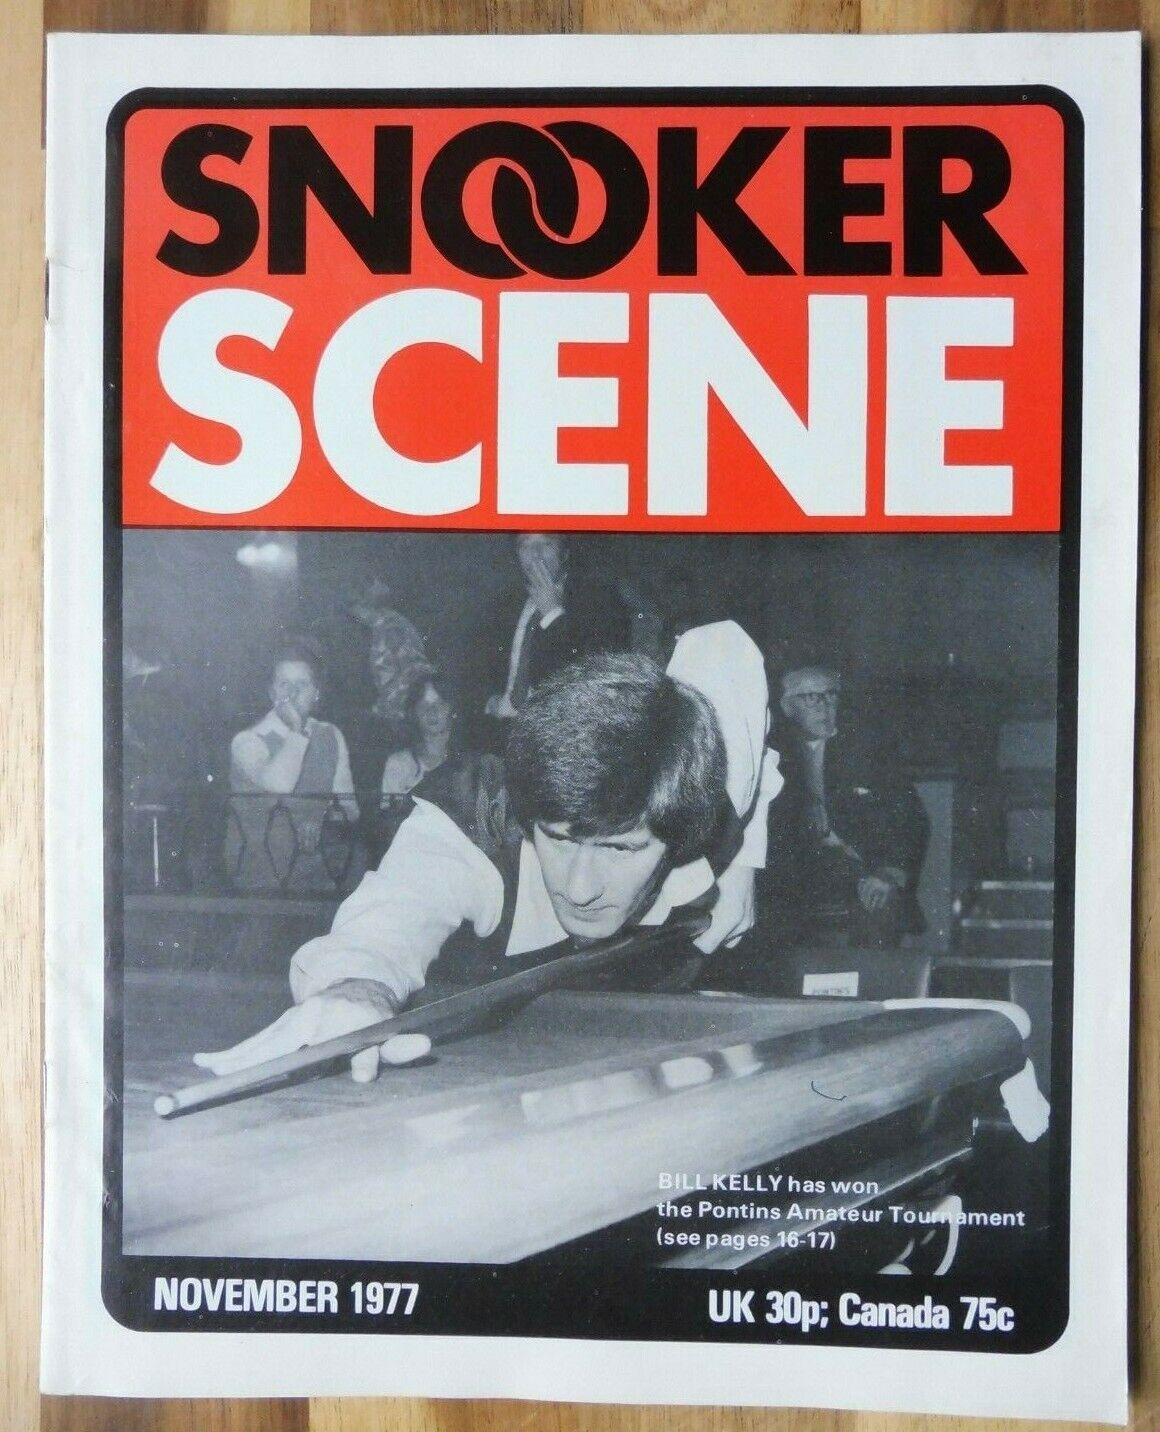 Snooker Scene Magazine, November 1977, Good Condition.